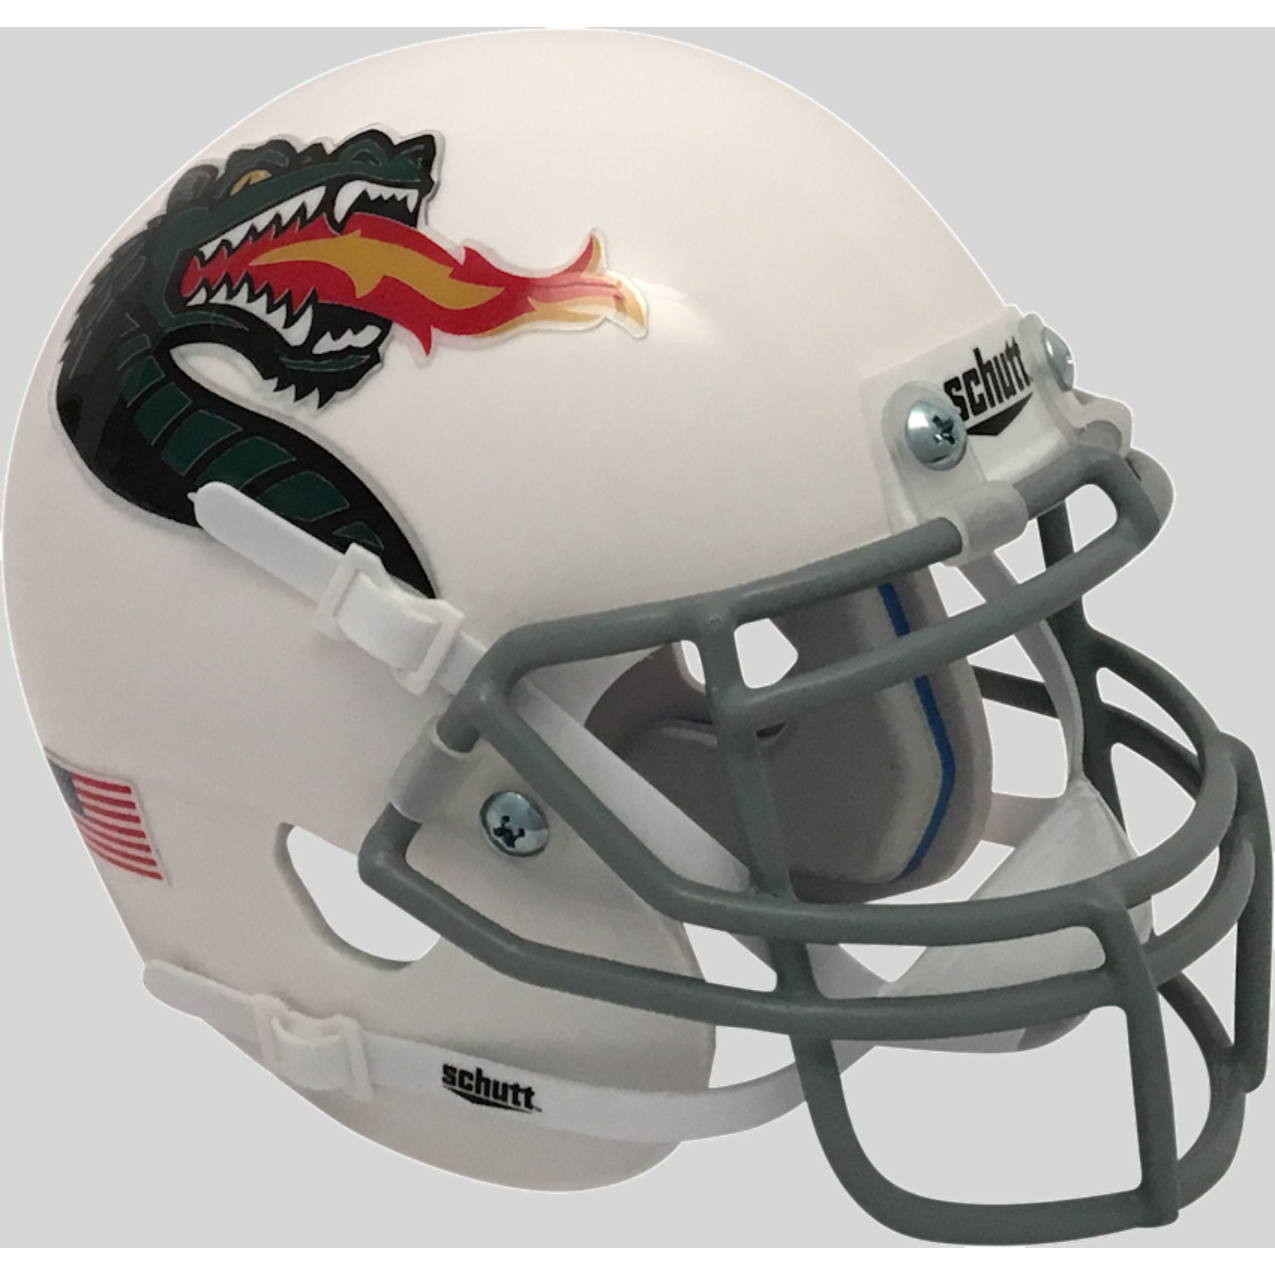 d83ca5f24a8 UAB Alabama-Birmingham Blazers Alternate 3 White Schutt Mini Authentic  Helmet. Schutt. Image 1